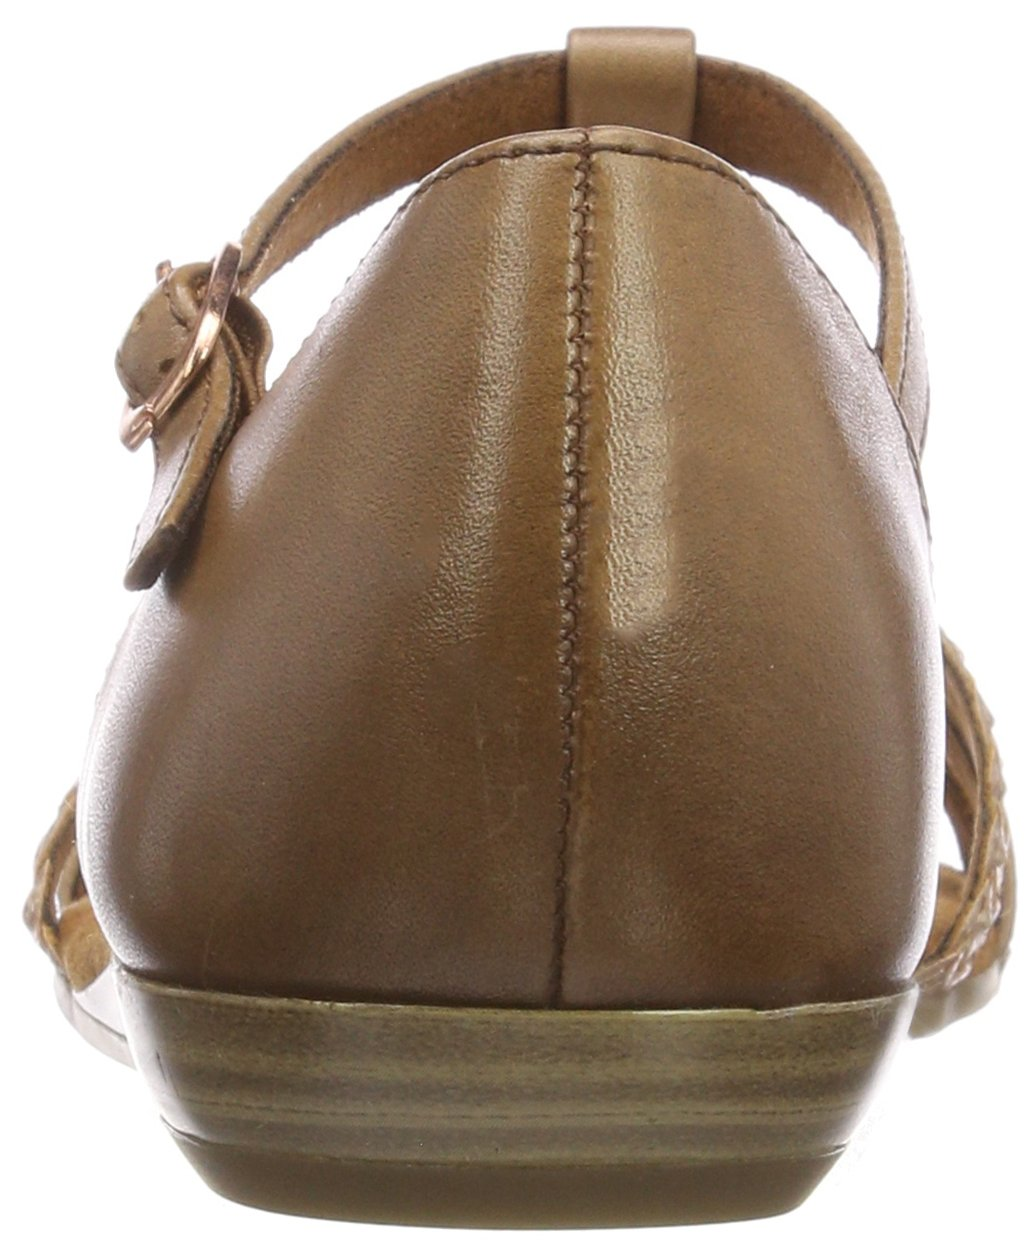 Tamaris Damen 28137 RiemchenSandale Braun (Cognac/Copper) (Cognac/Copper) Braun 6391b9